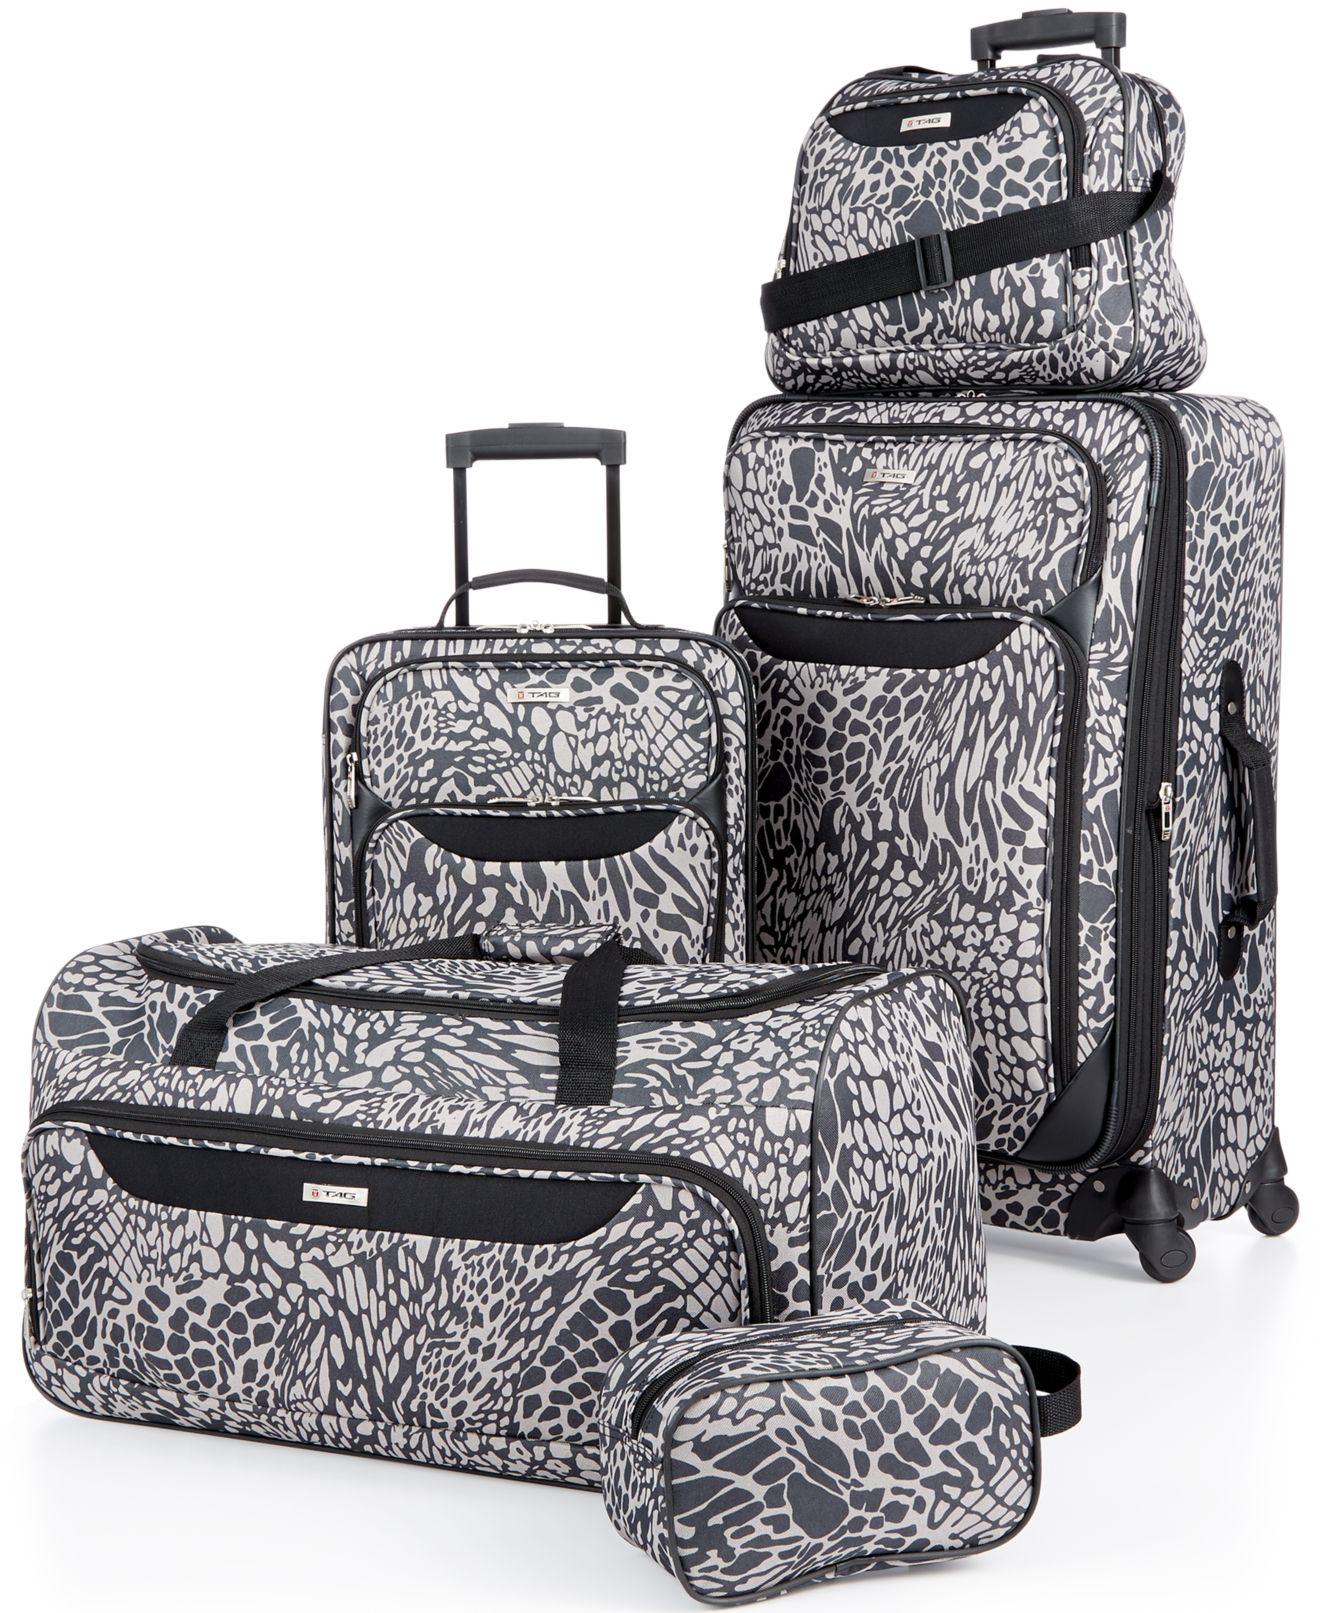 Hawaiian Luggage Sets Print 5 Piece Luggage Set